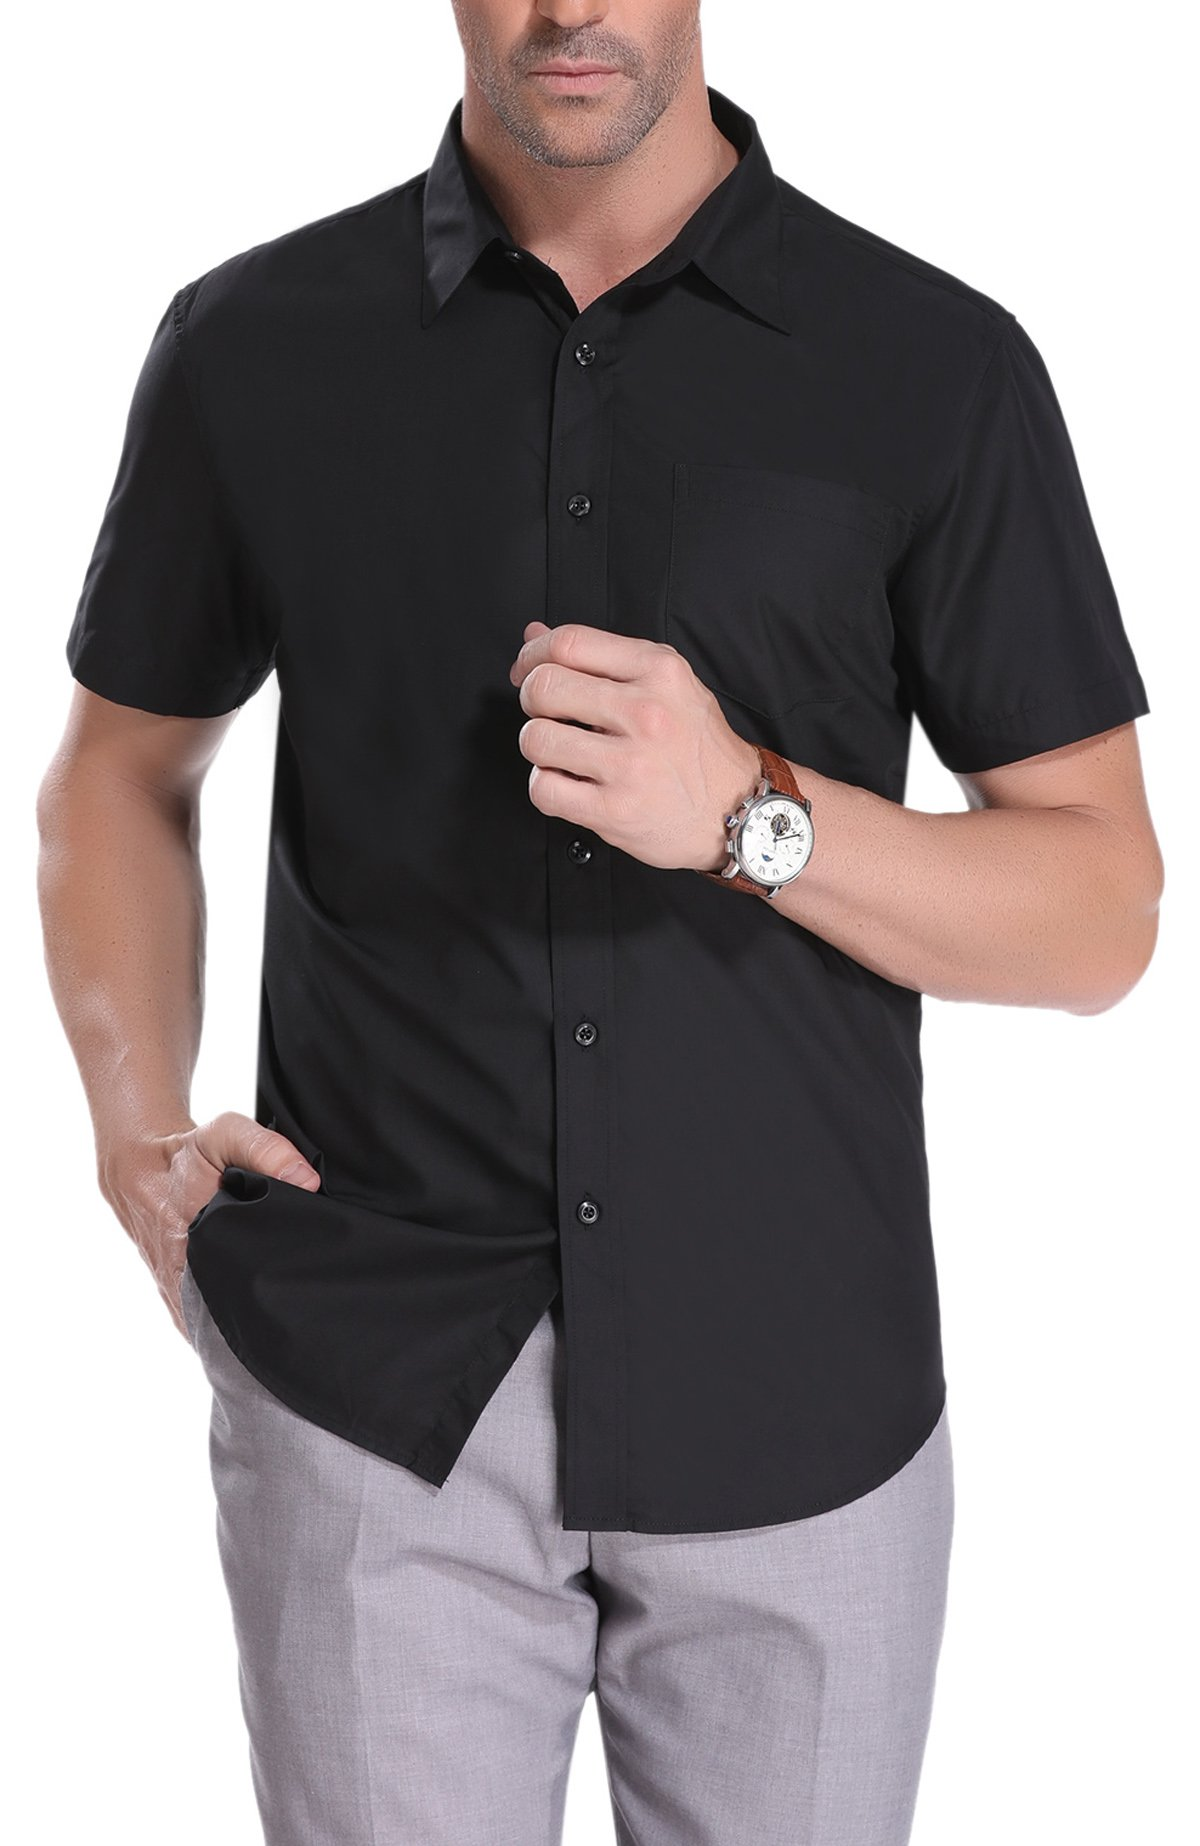 iClosam Men's Casual Short Sleeve Long Sleeve Button Down Shirt Collar Dress Shirt (Black, XX-Large)